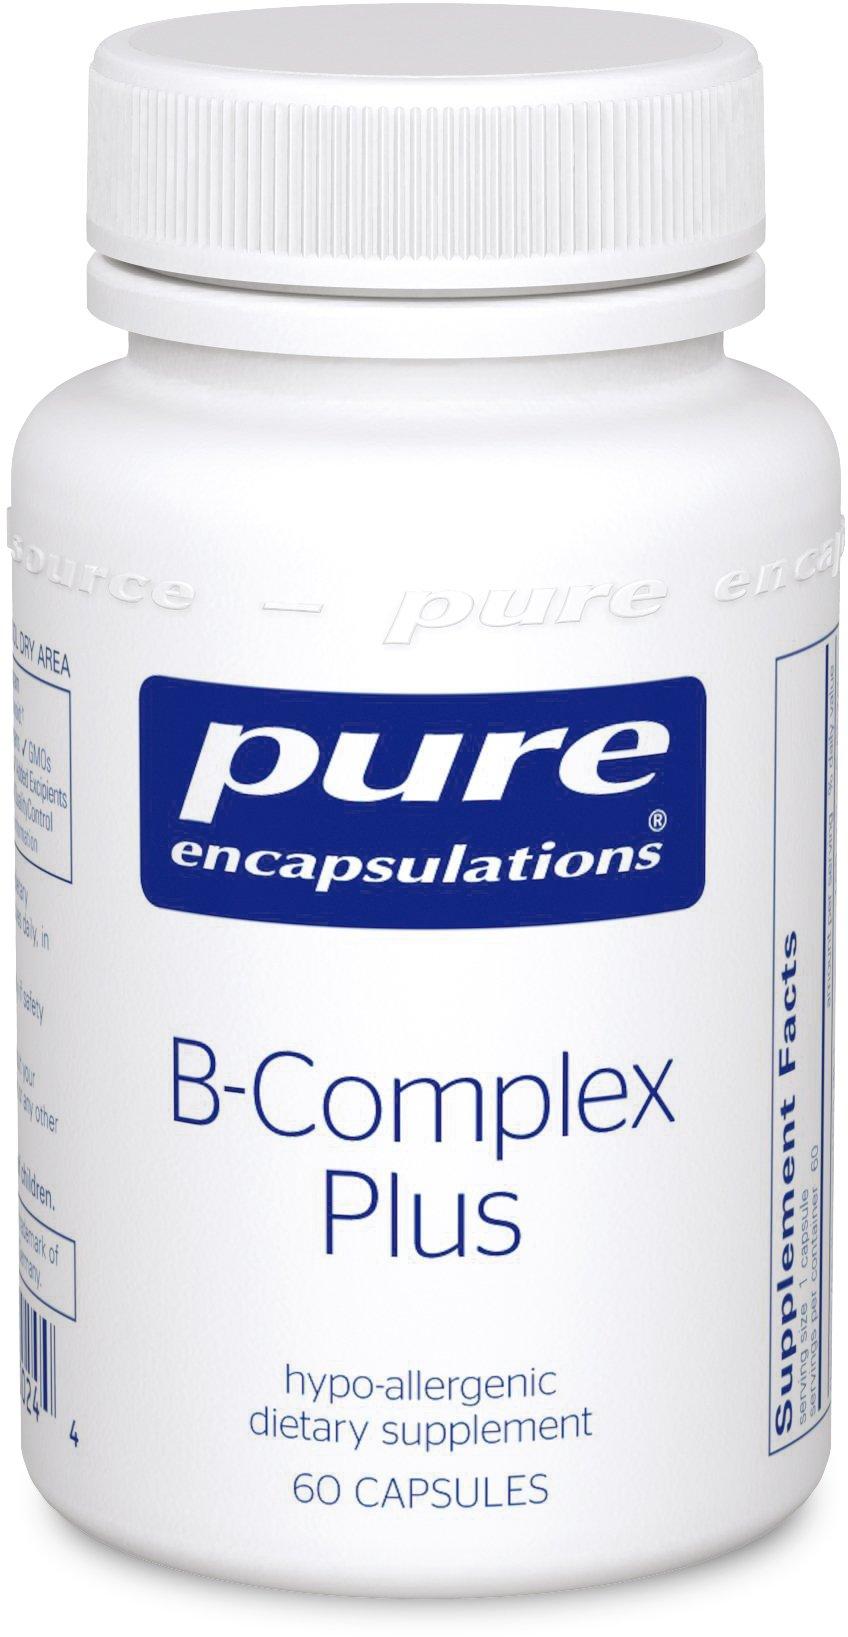 Pure Encapsulations - B-Complex Plus - Balanced B Vitamin Formula with Metafolin® L-5-MTHF and Vitamin B12 - 60 Capsules